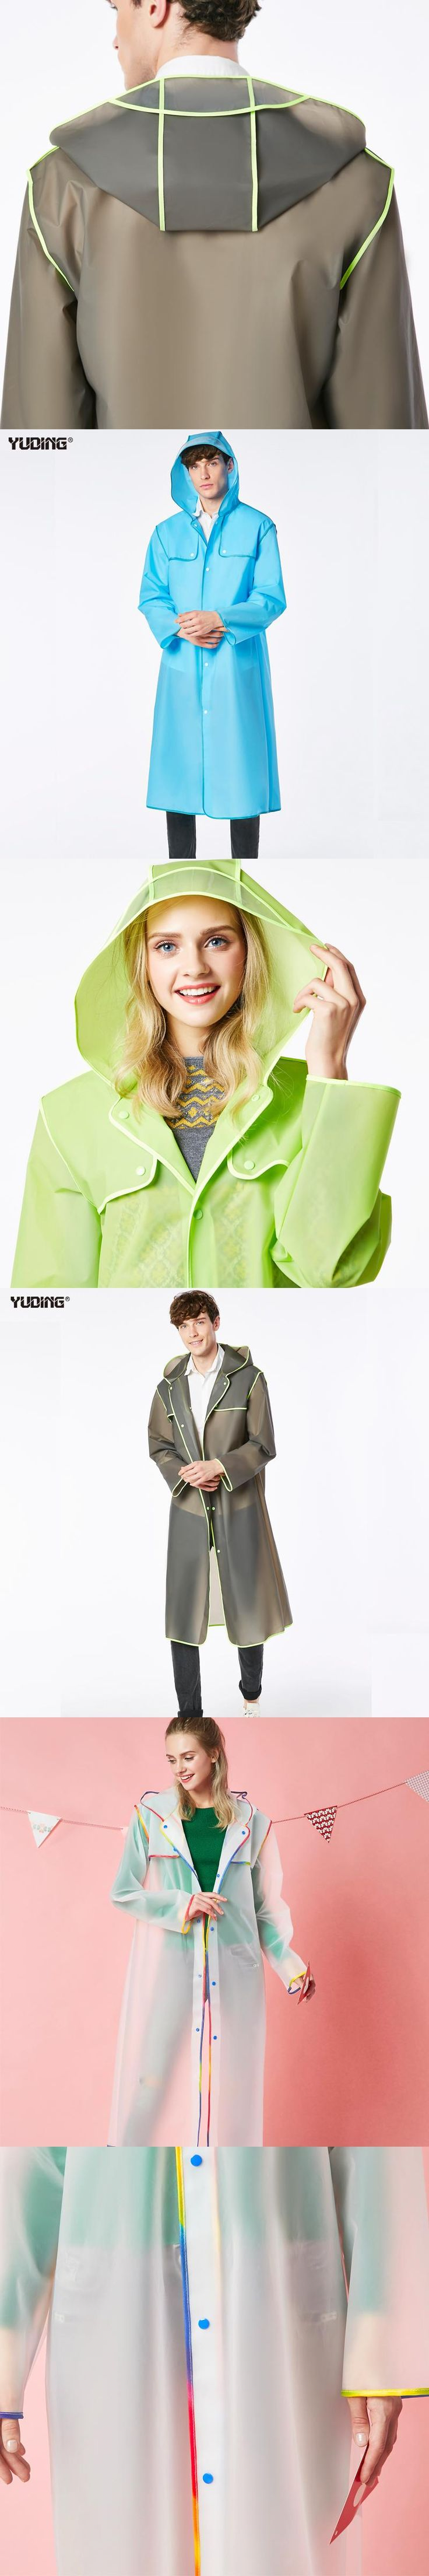 Long Raincoat EVA Thick Rainwear Universal Waterproof Poncho Hiking Tour Hooded Rain Coat Colorful Hem